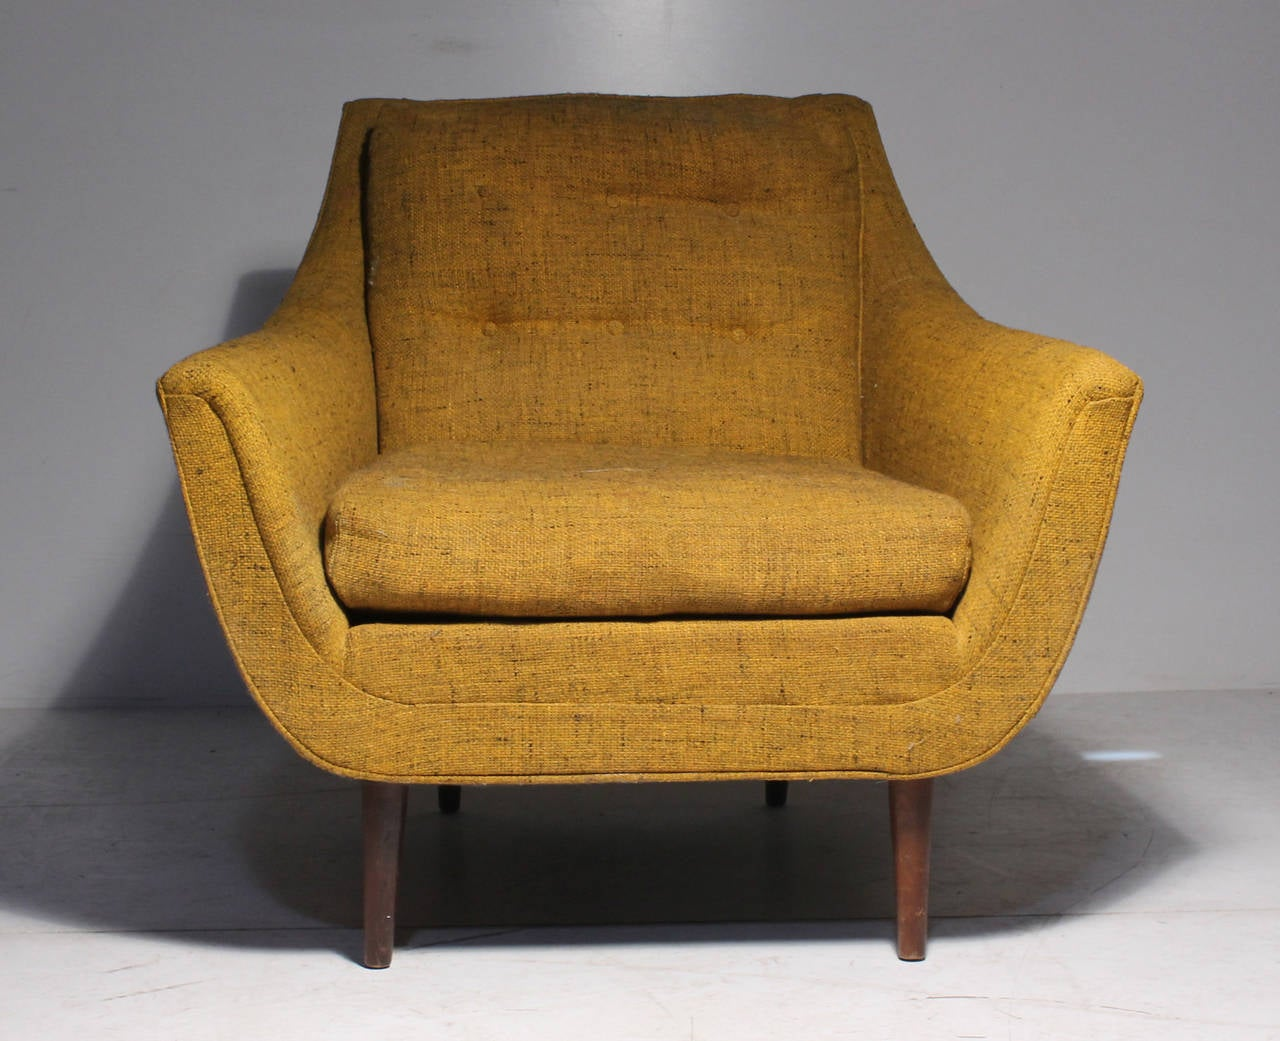 Danish Modern Vintage Lounge Chair Attrib Selig Milo Baughman Adrian Pearsa